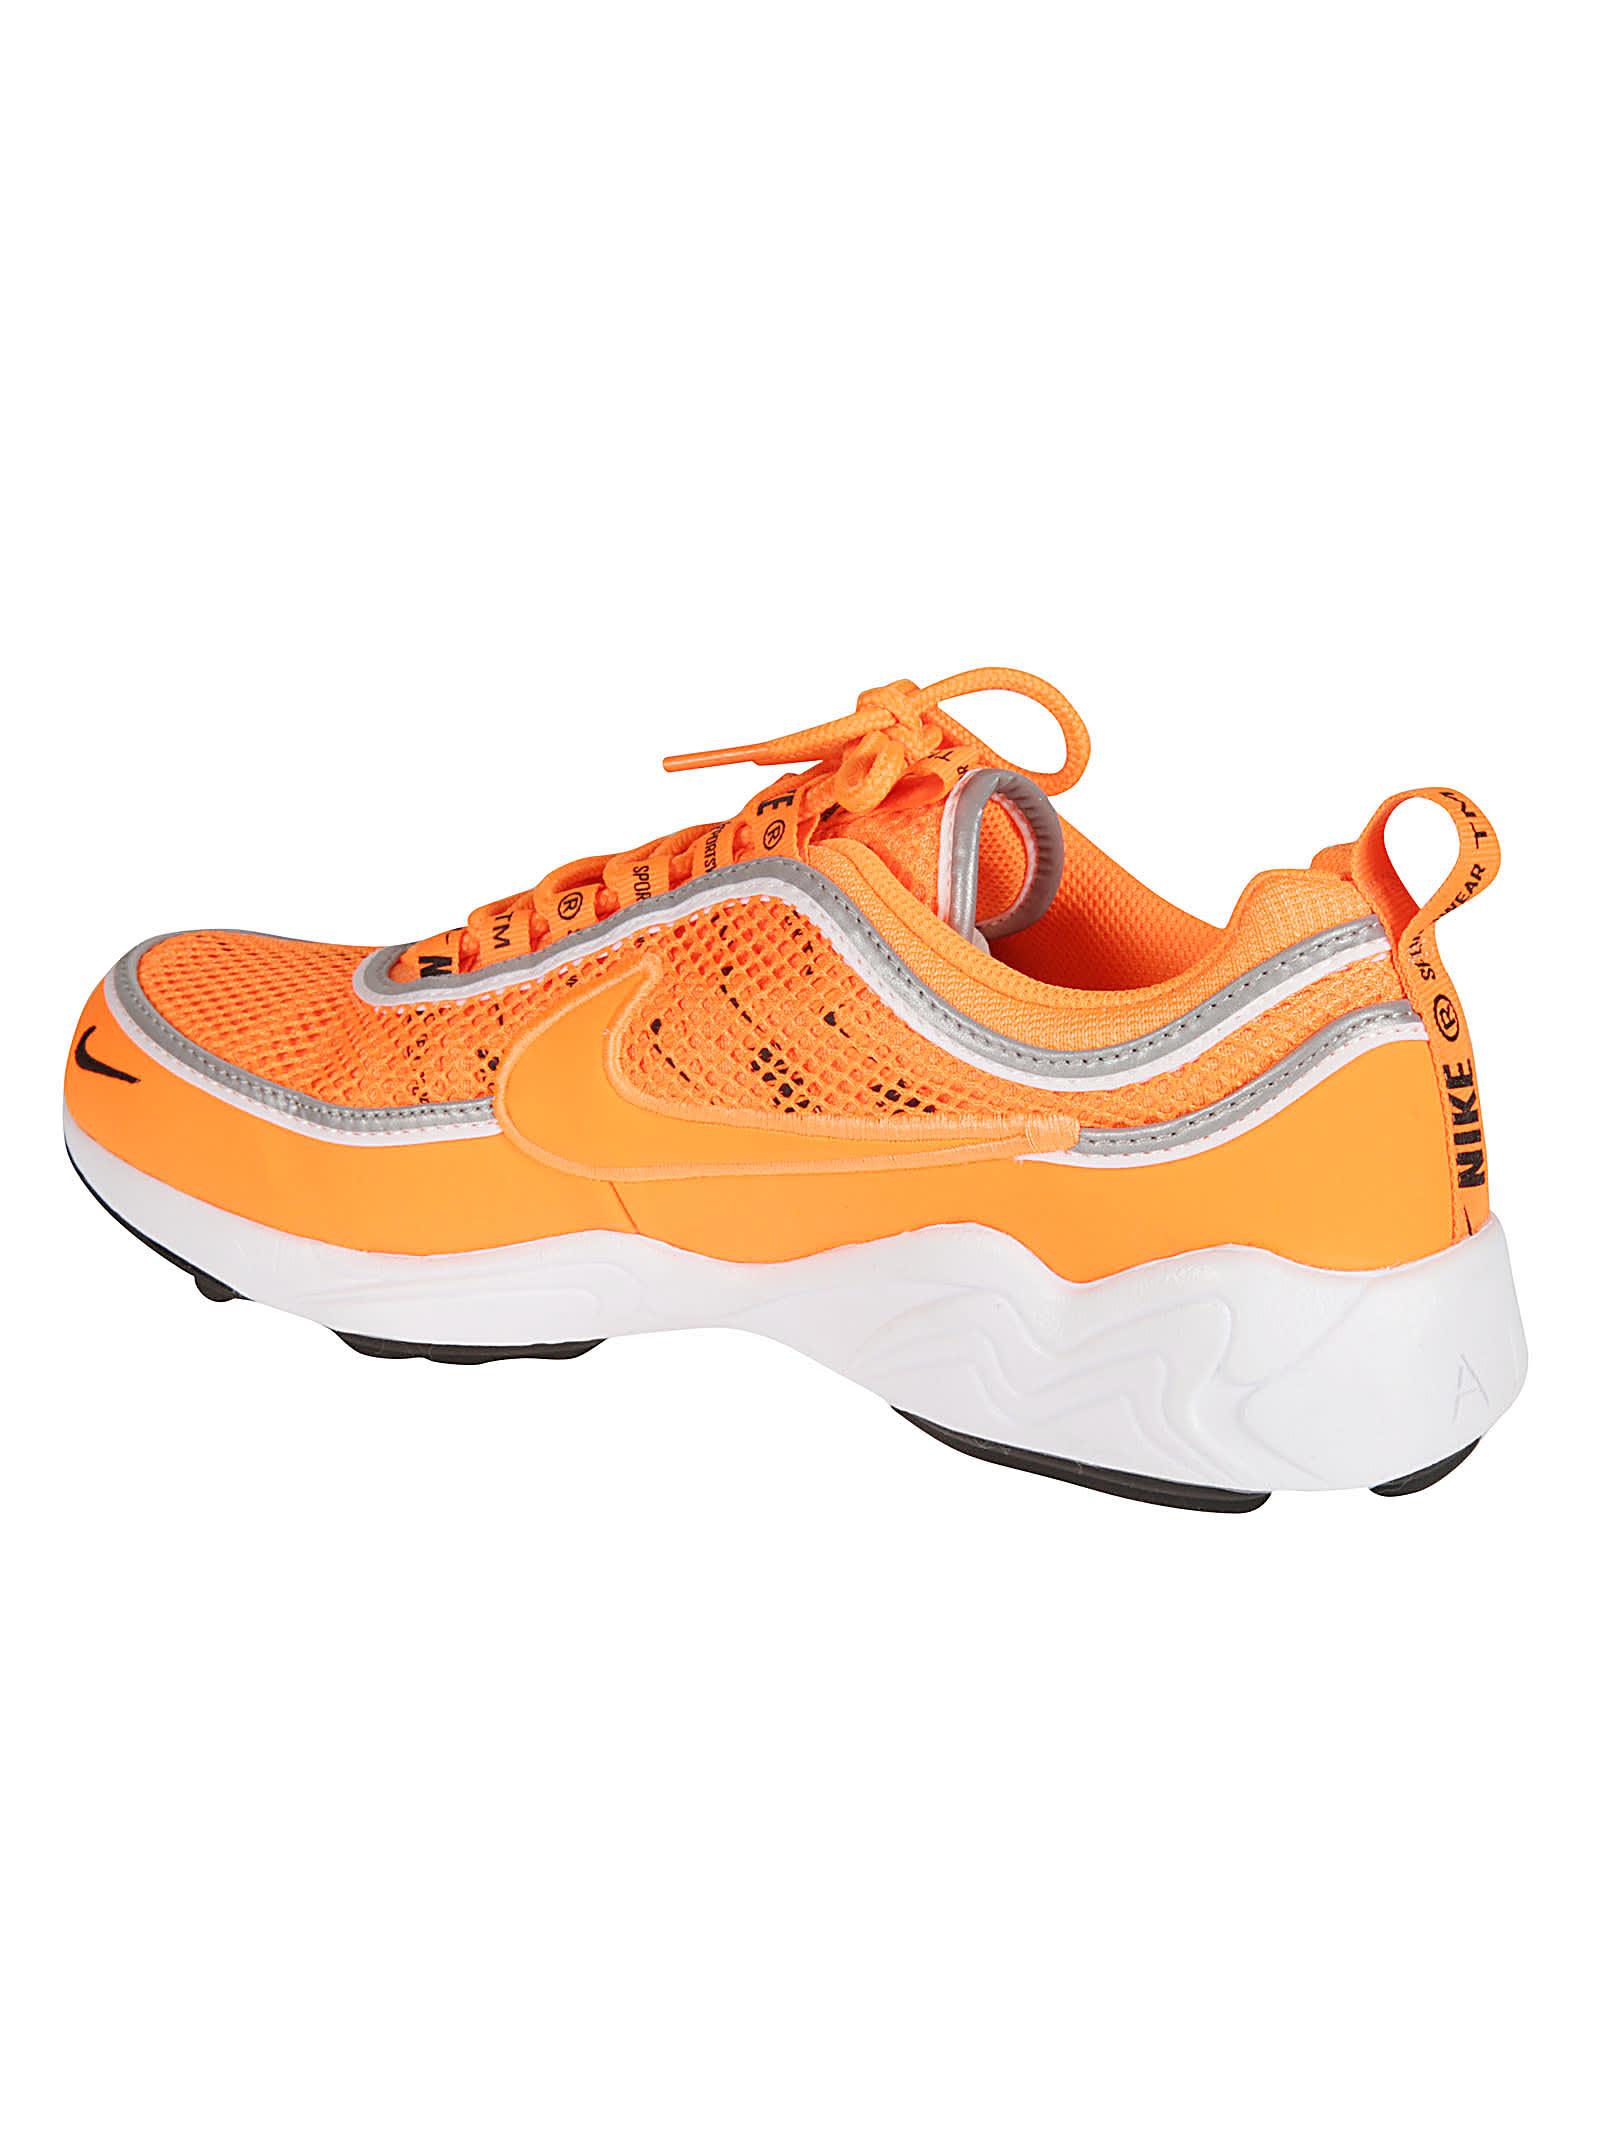 le dernier f57c7 b8b26 Nike Nike Air Zoom Spiridon 16 Sneakers